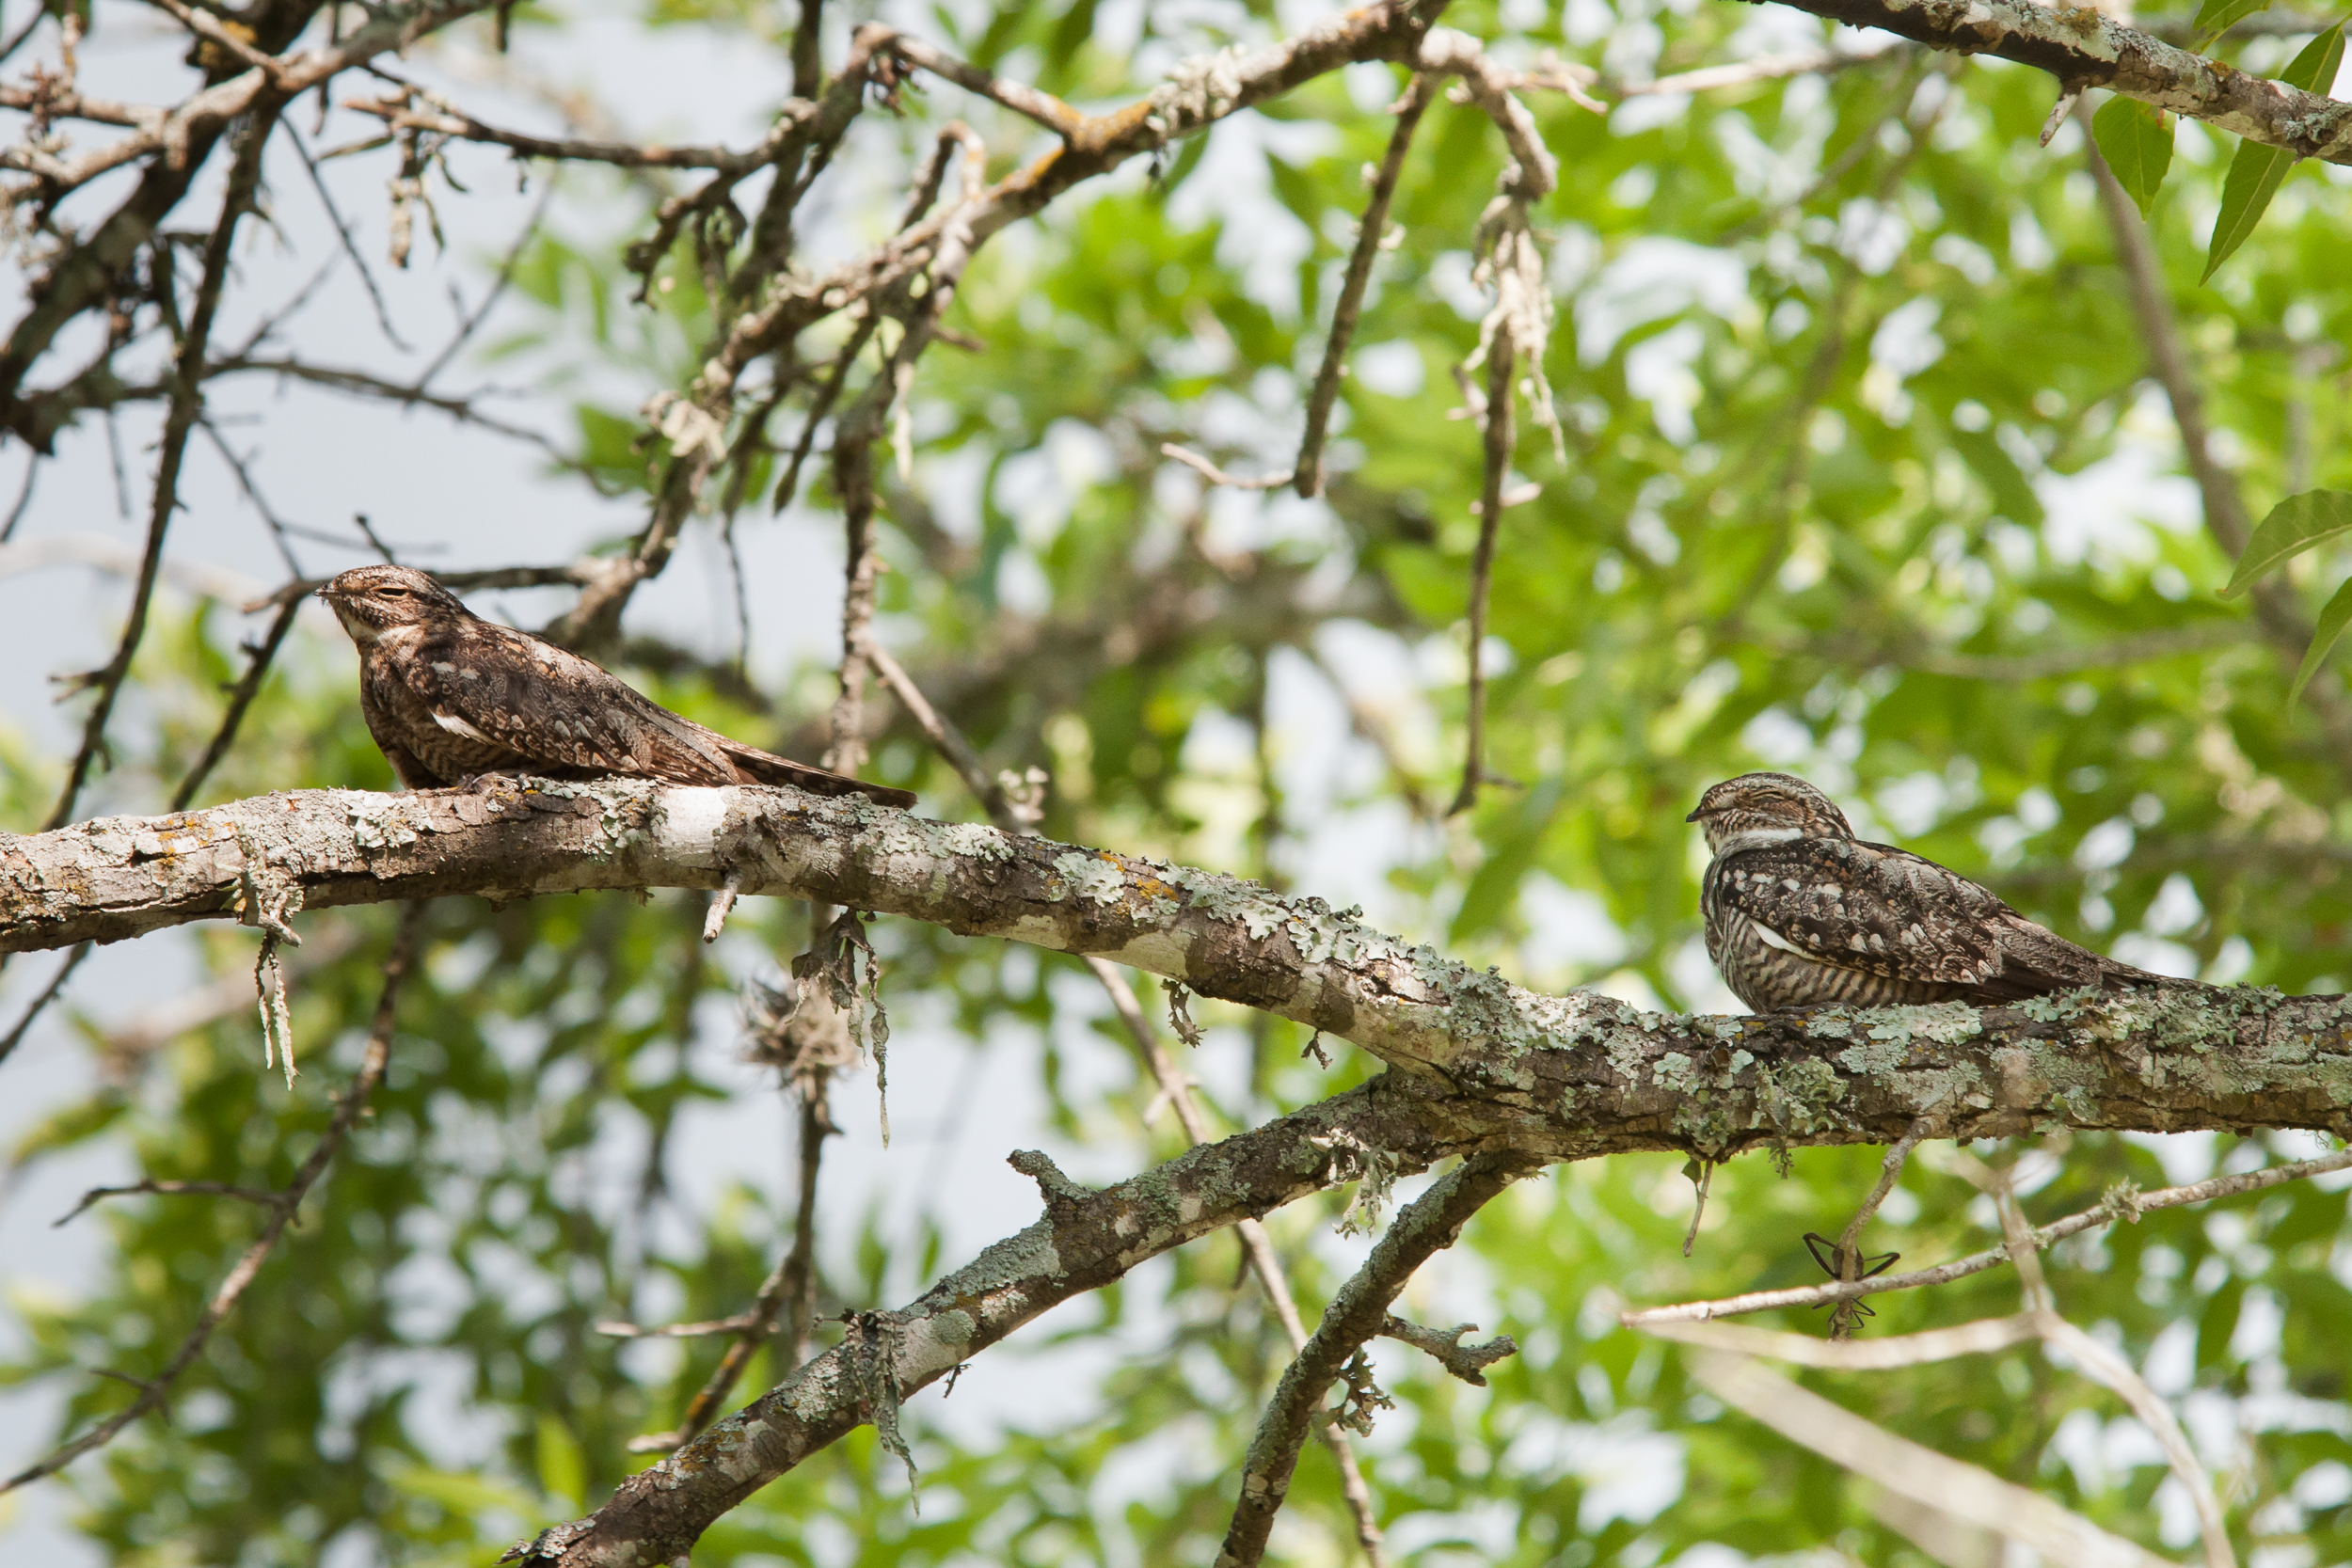 Species: Lesser Nighthawk Photo Credit: Alyssia Church Date: June 2016 Location: Crescent Bend Nature Park